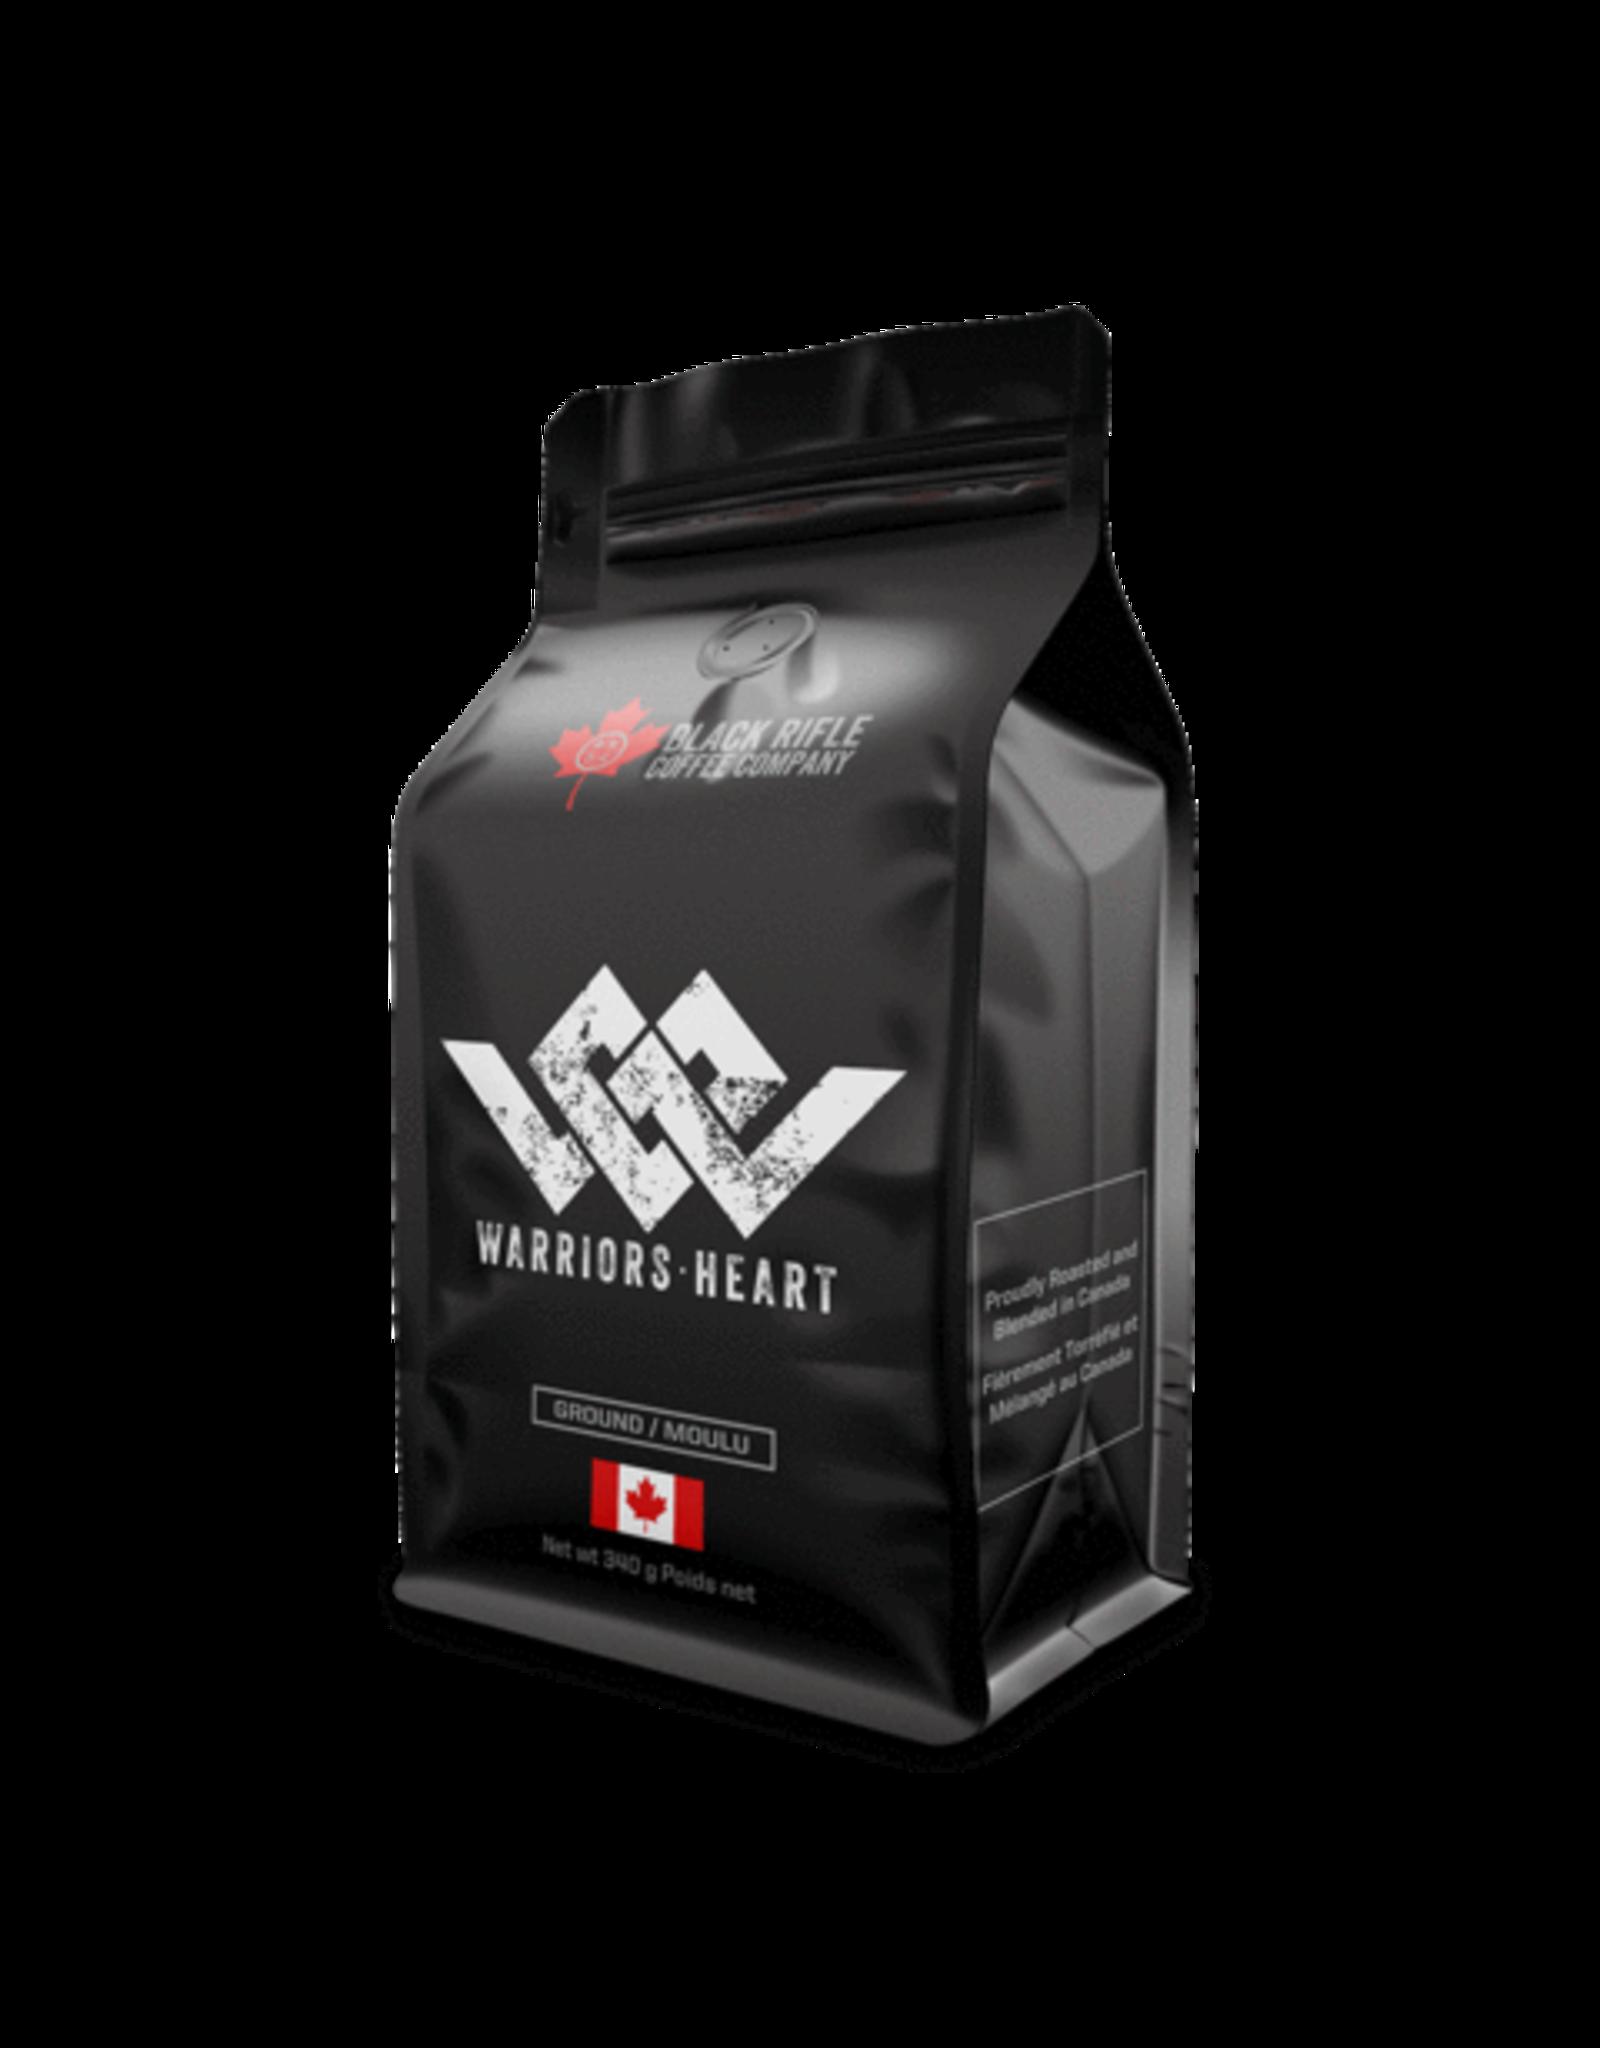 Black Rifle Warriors Heart Ground Coffee..12 oz bag